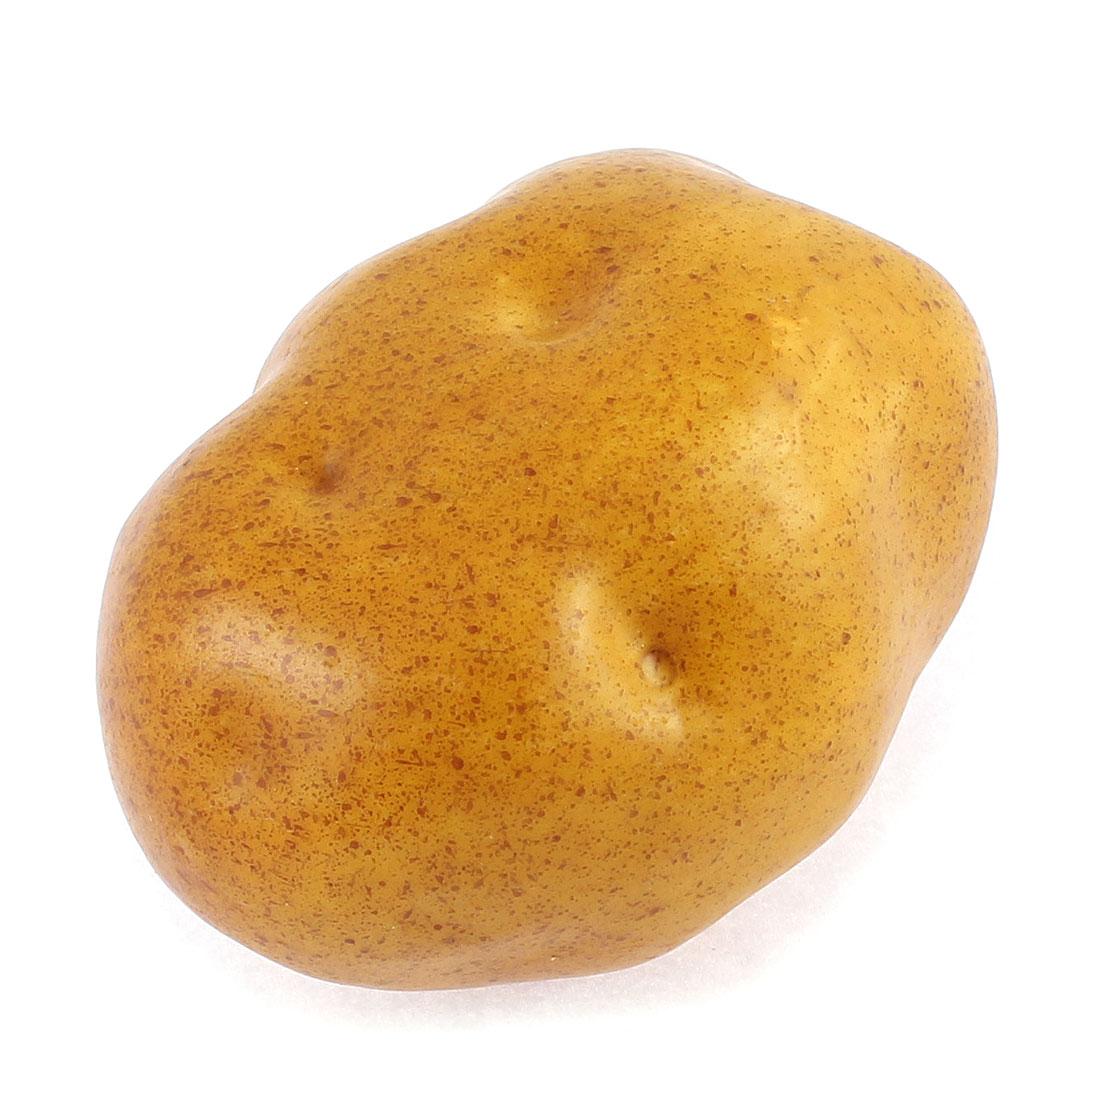 Artificial Brown Potato Decorative Fake Vegetable